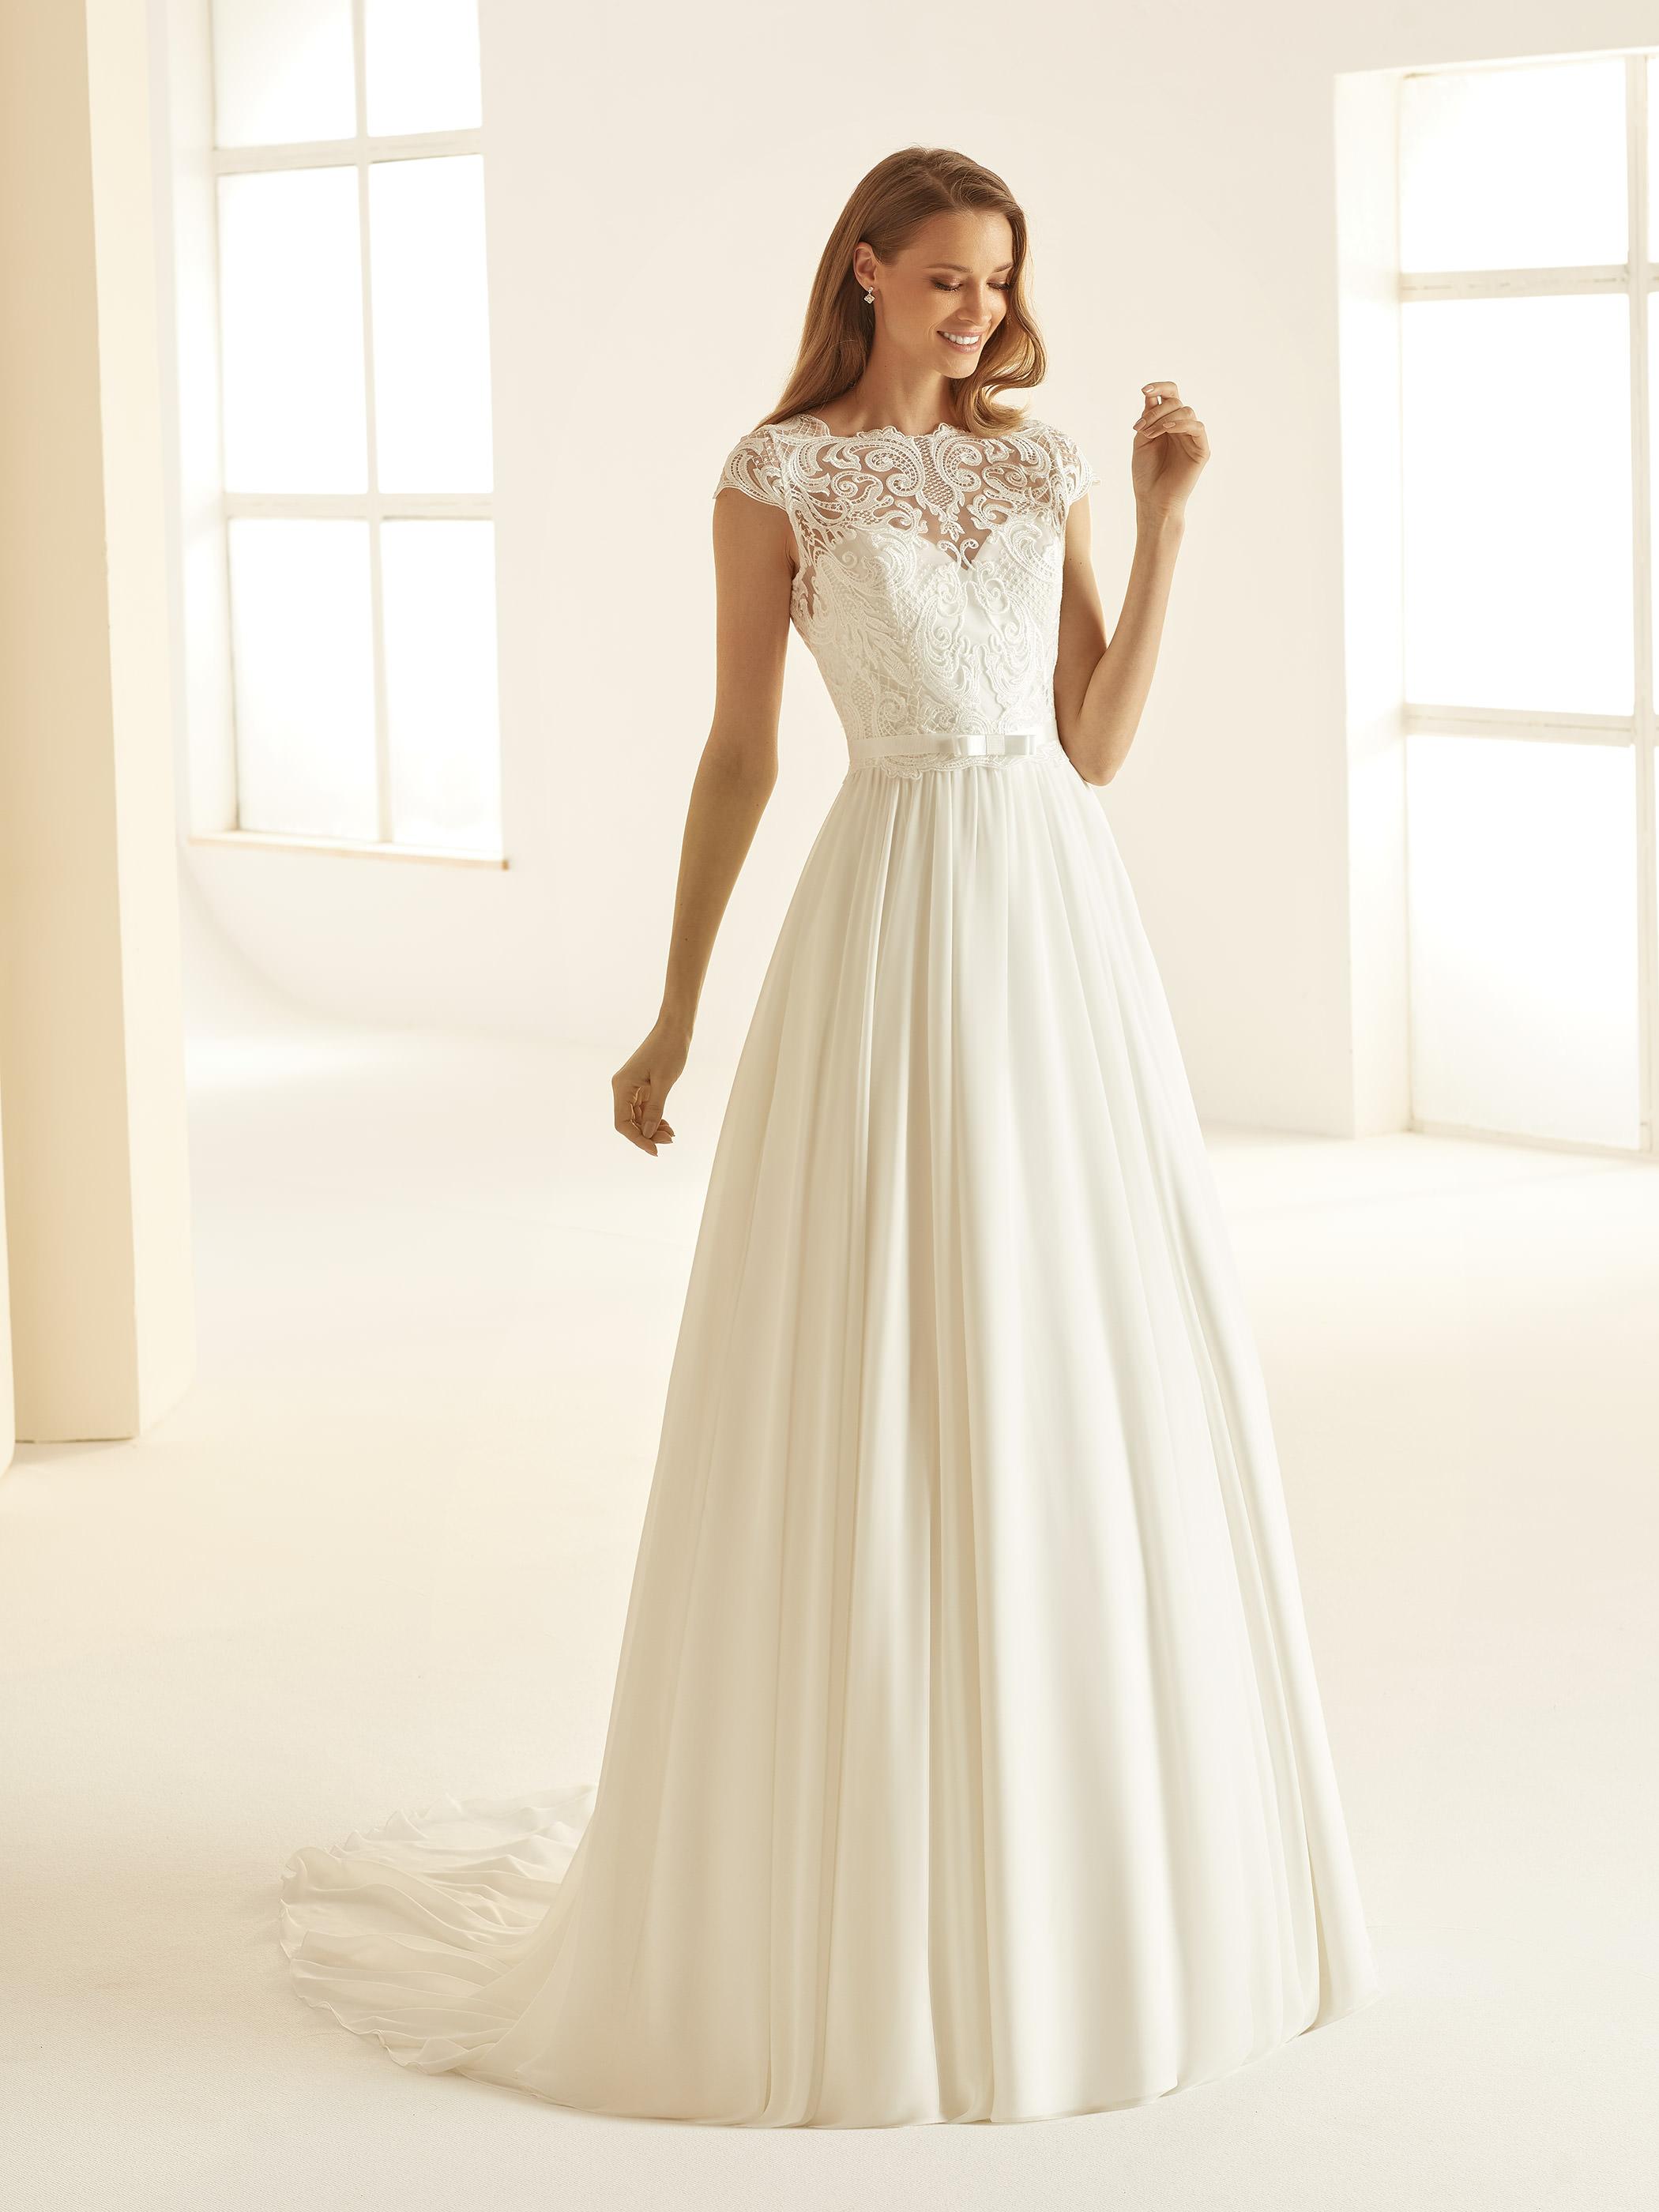 OLIVIA-Bianco-Evento-bridal-dress-(1)